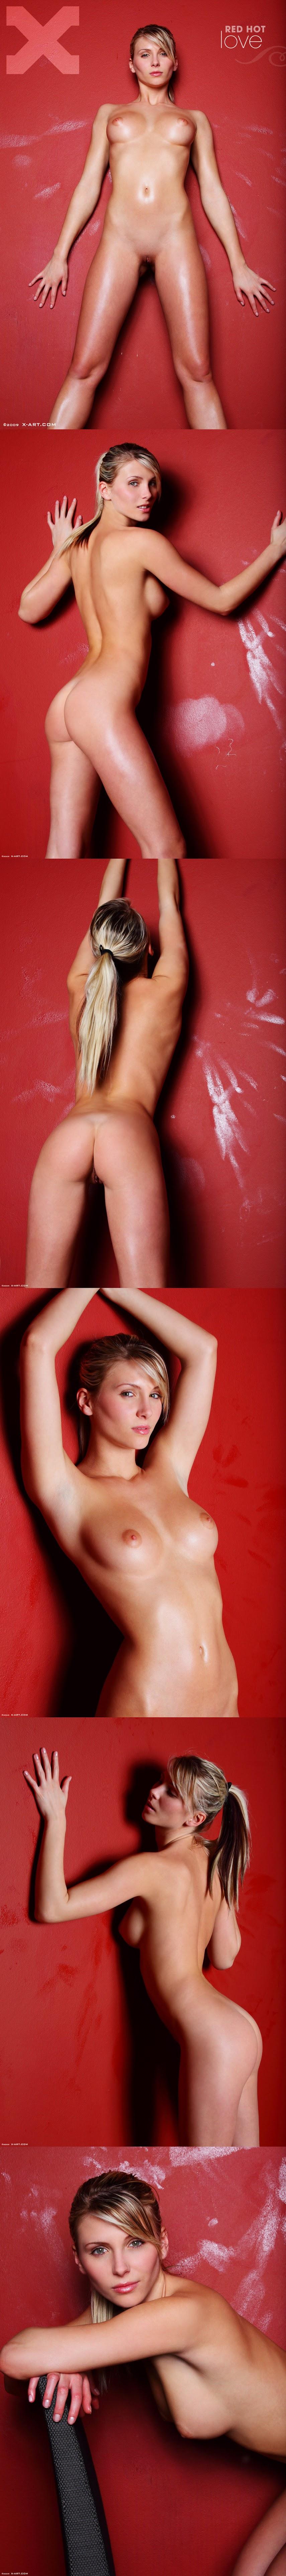 x-art nicole red hot love-lrg